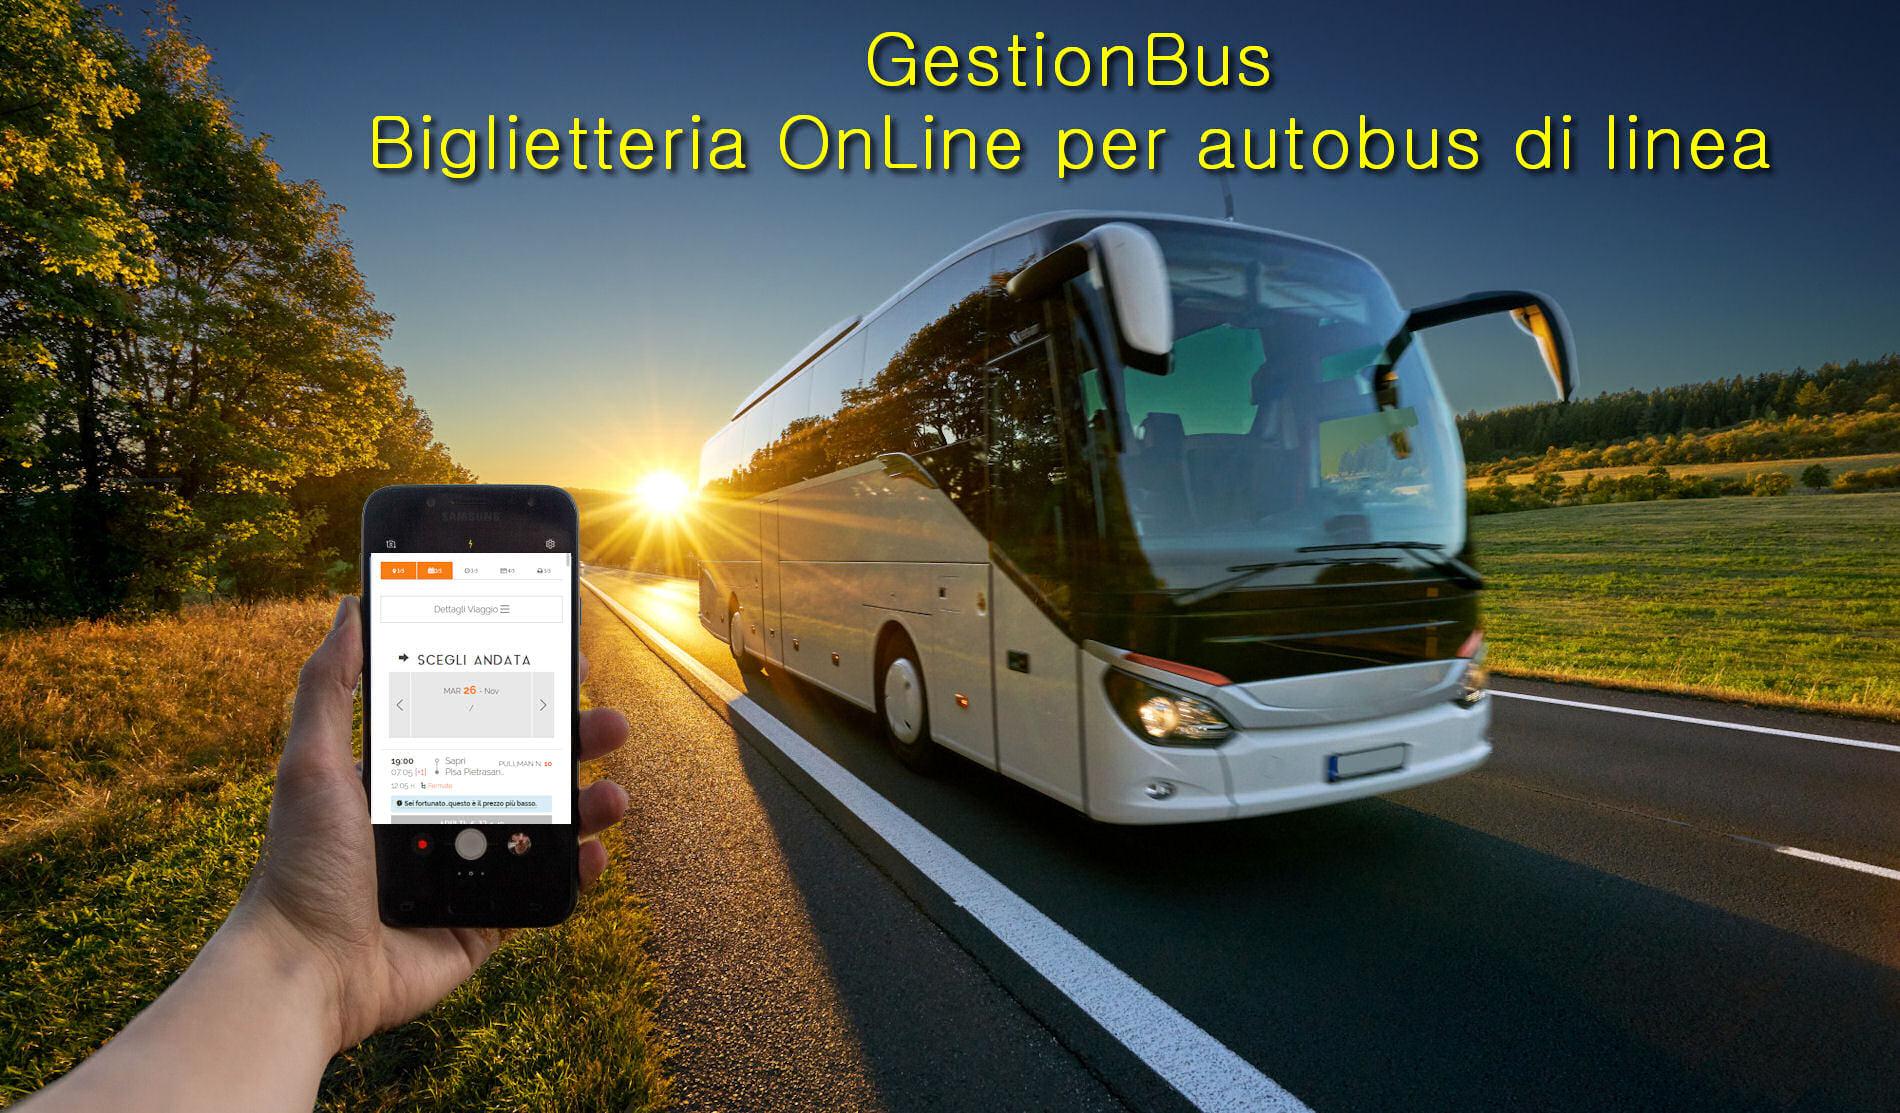 Gestionbus - software di biglietteria online per autobus di linea